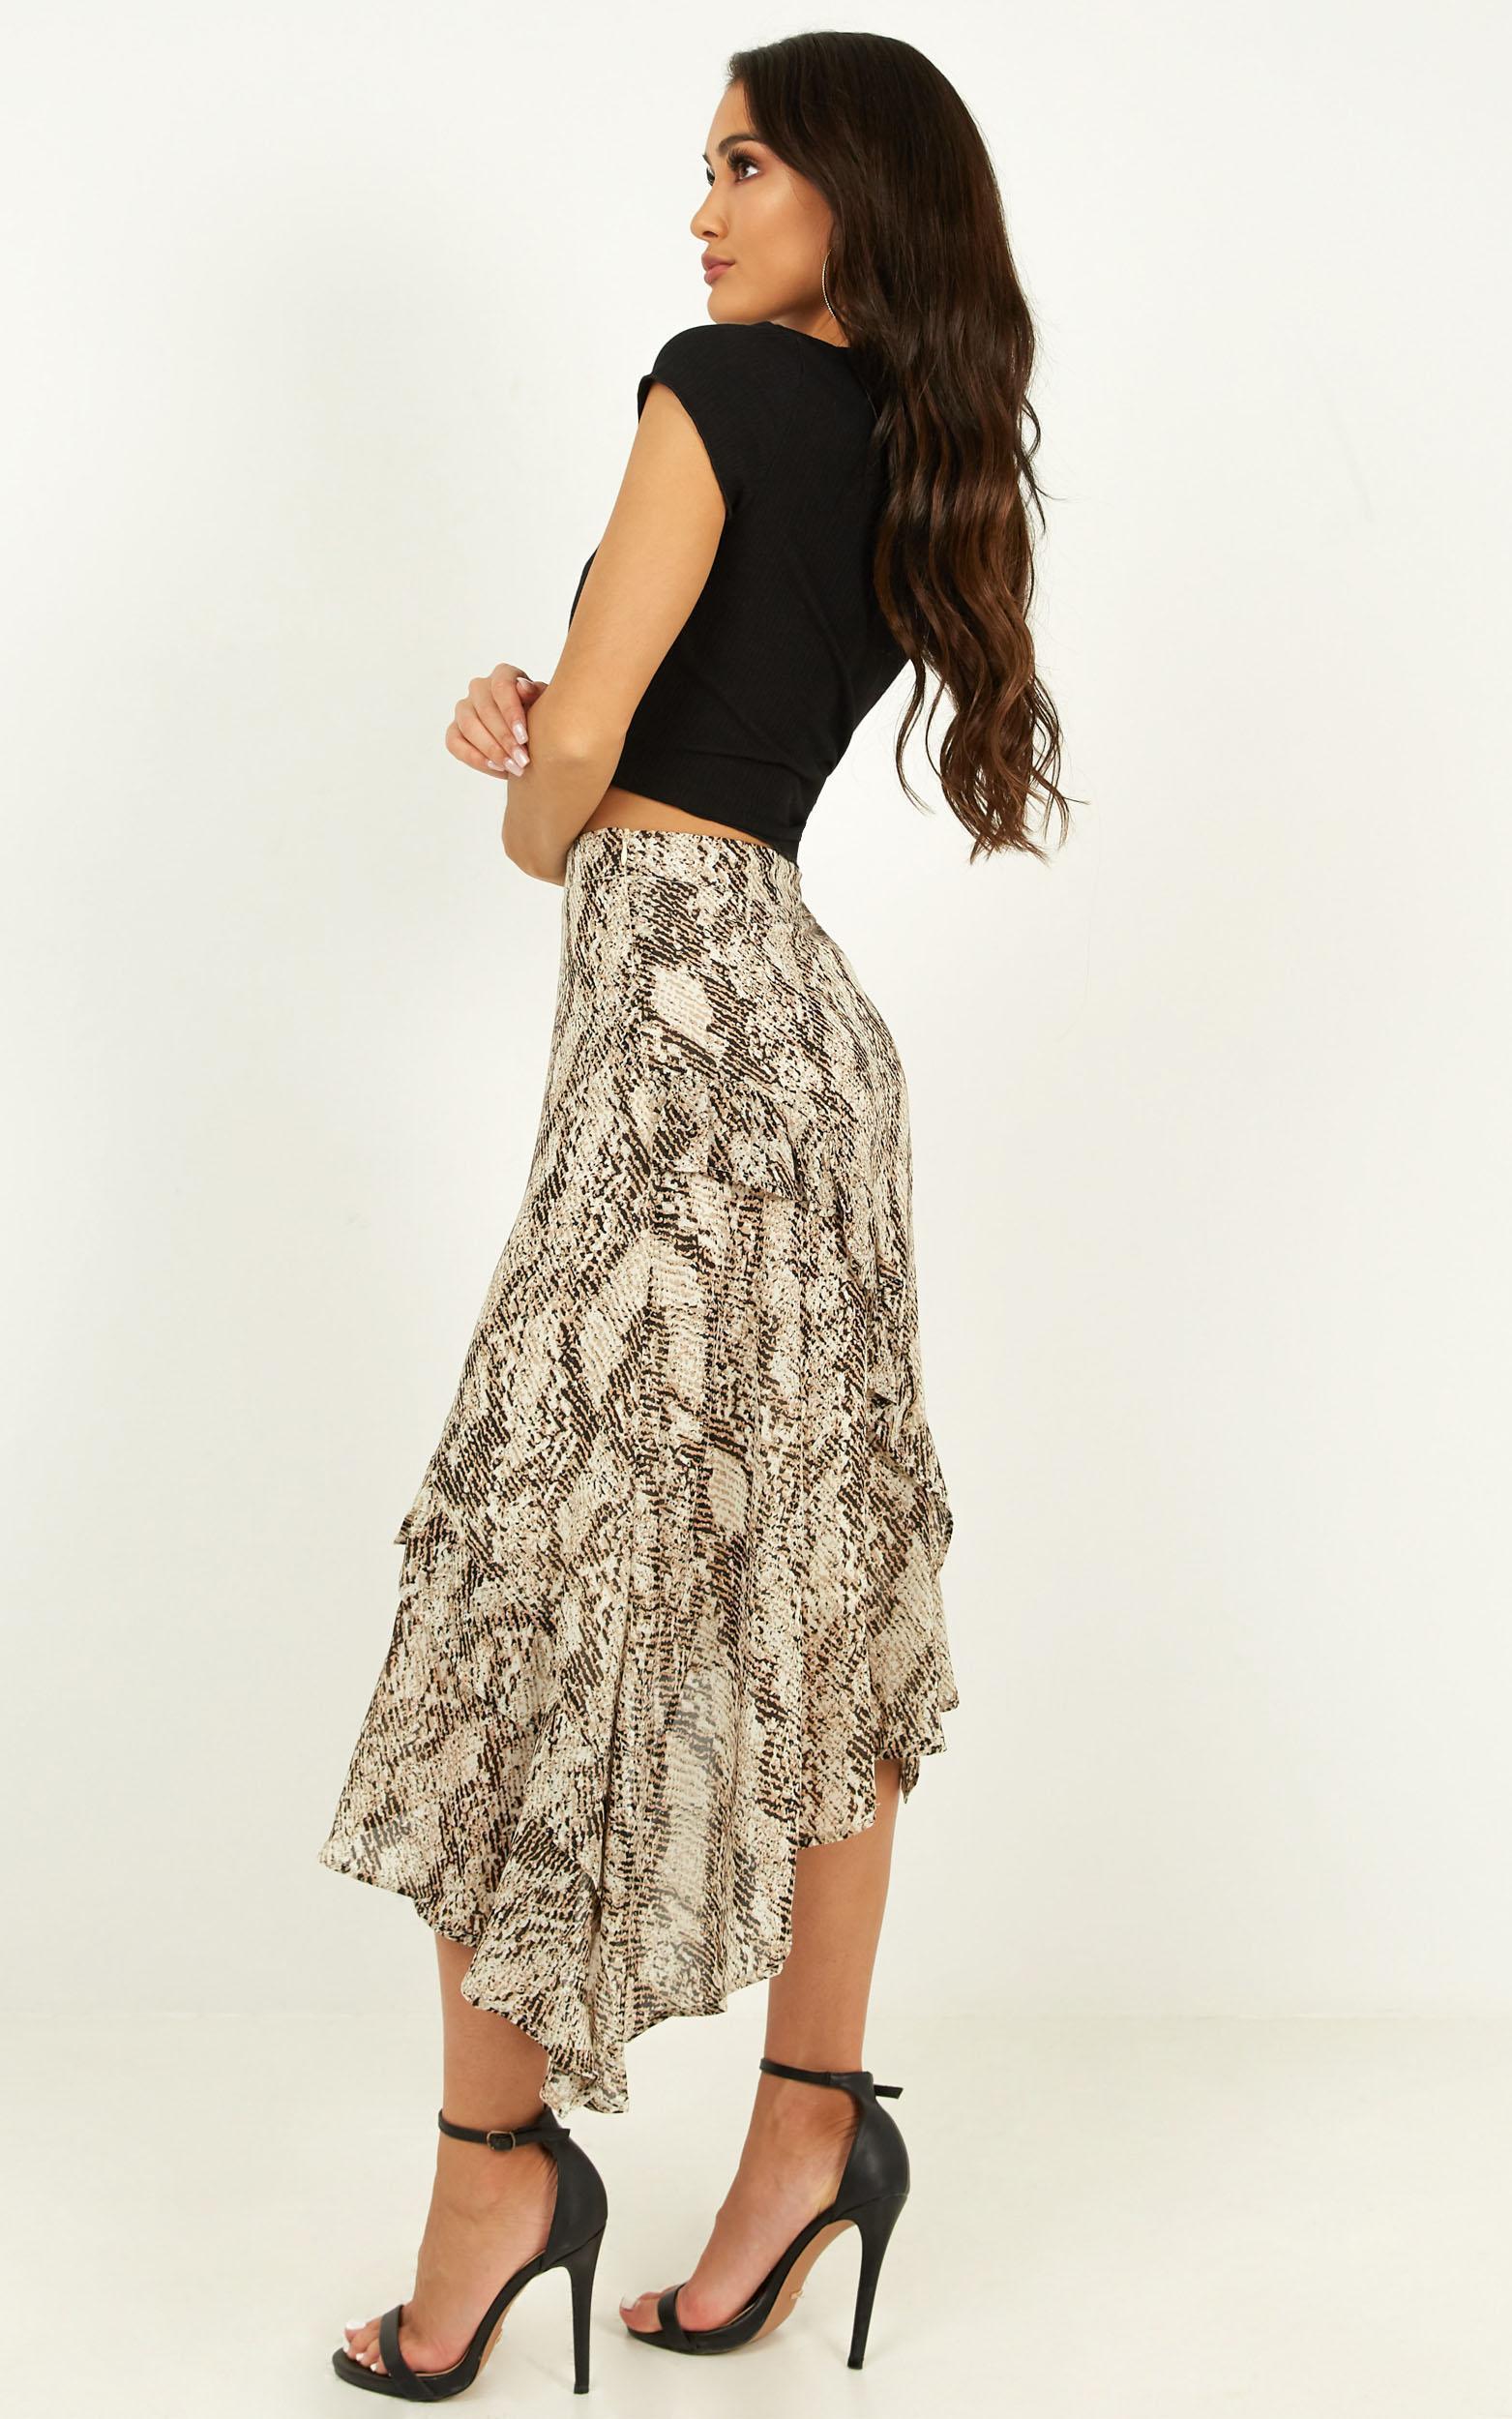 Lighter Than Air skirt in snake print - 10 (M), Grey, hi-res image number null